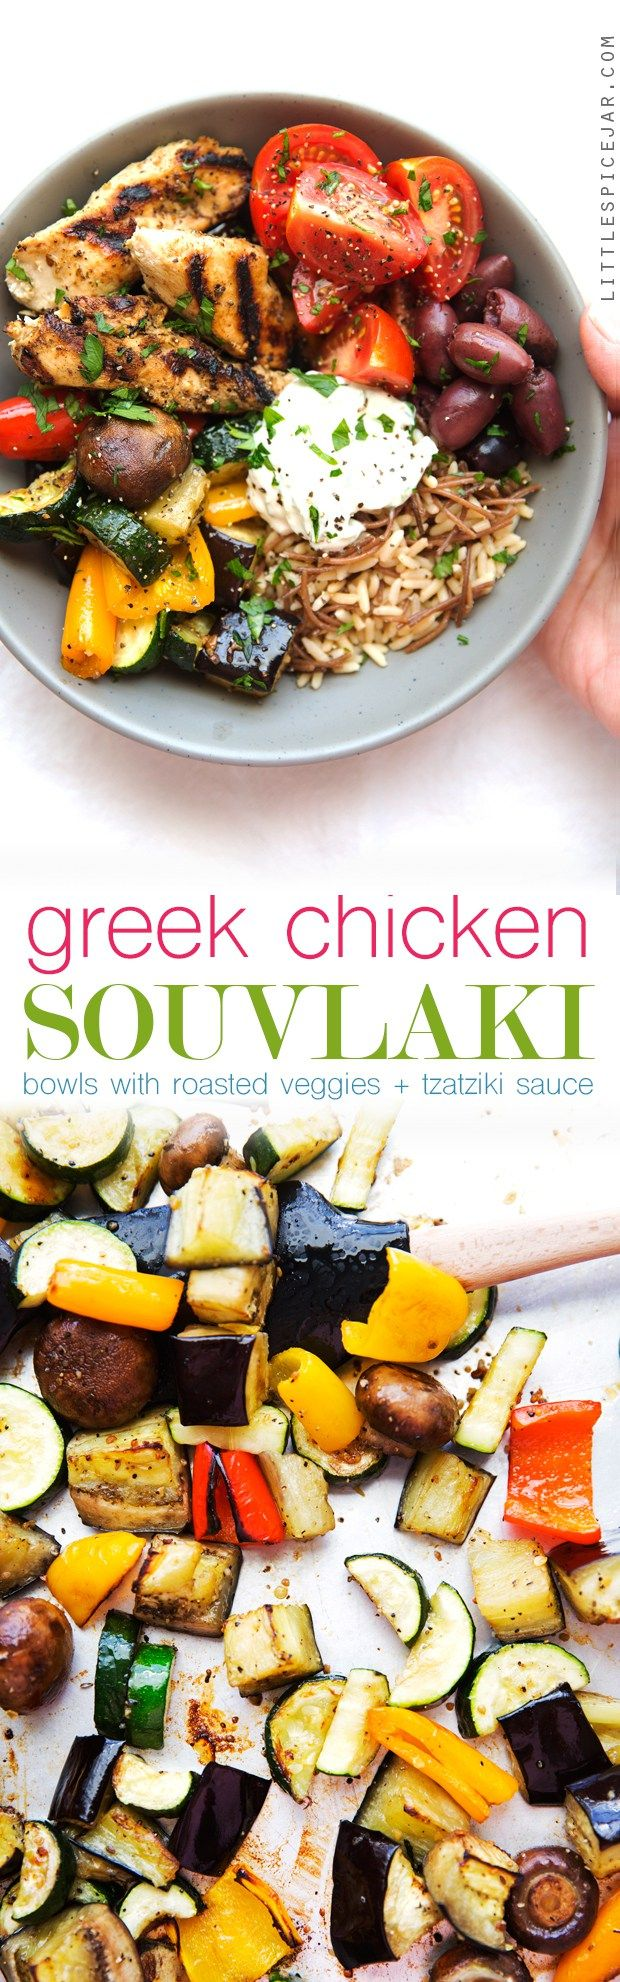 Greek Chicken Souvlaki Bowls with Roasted Veggies - A simple #mealprep meal made…